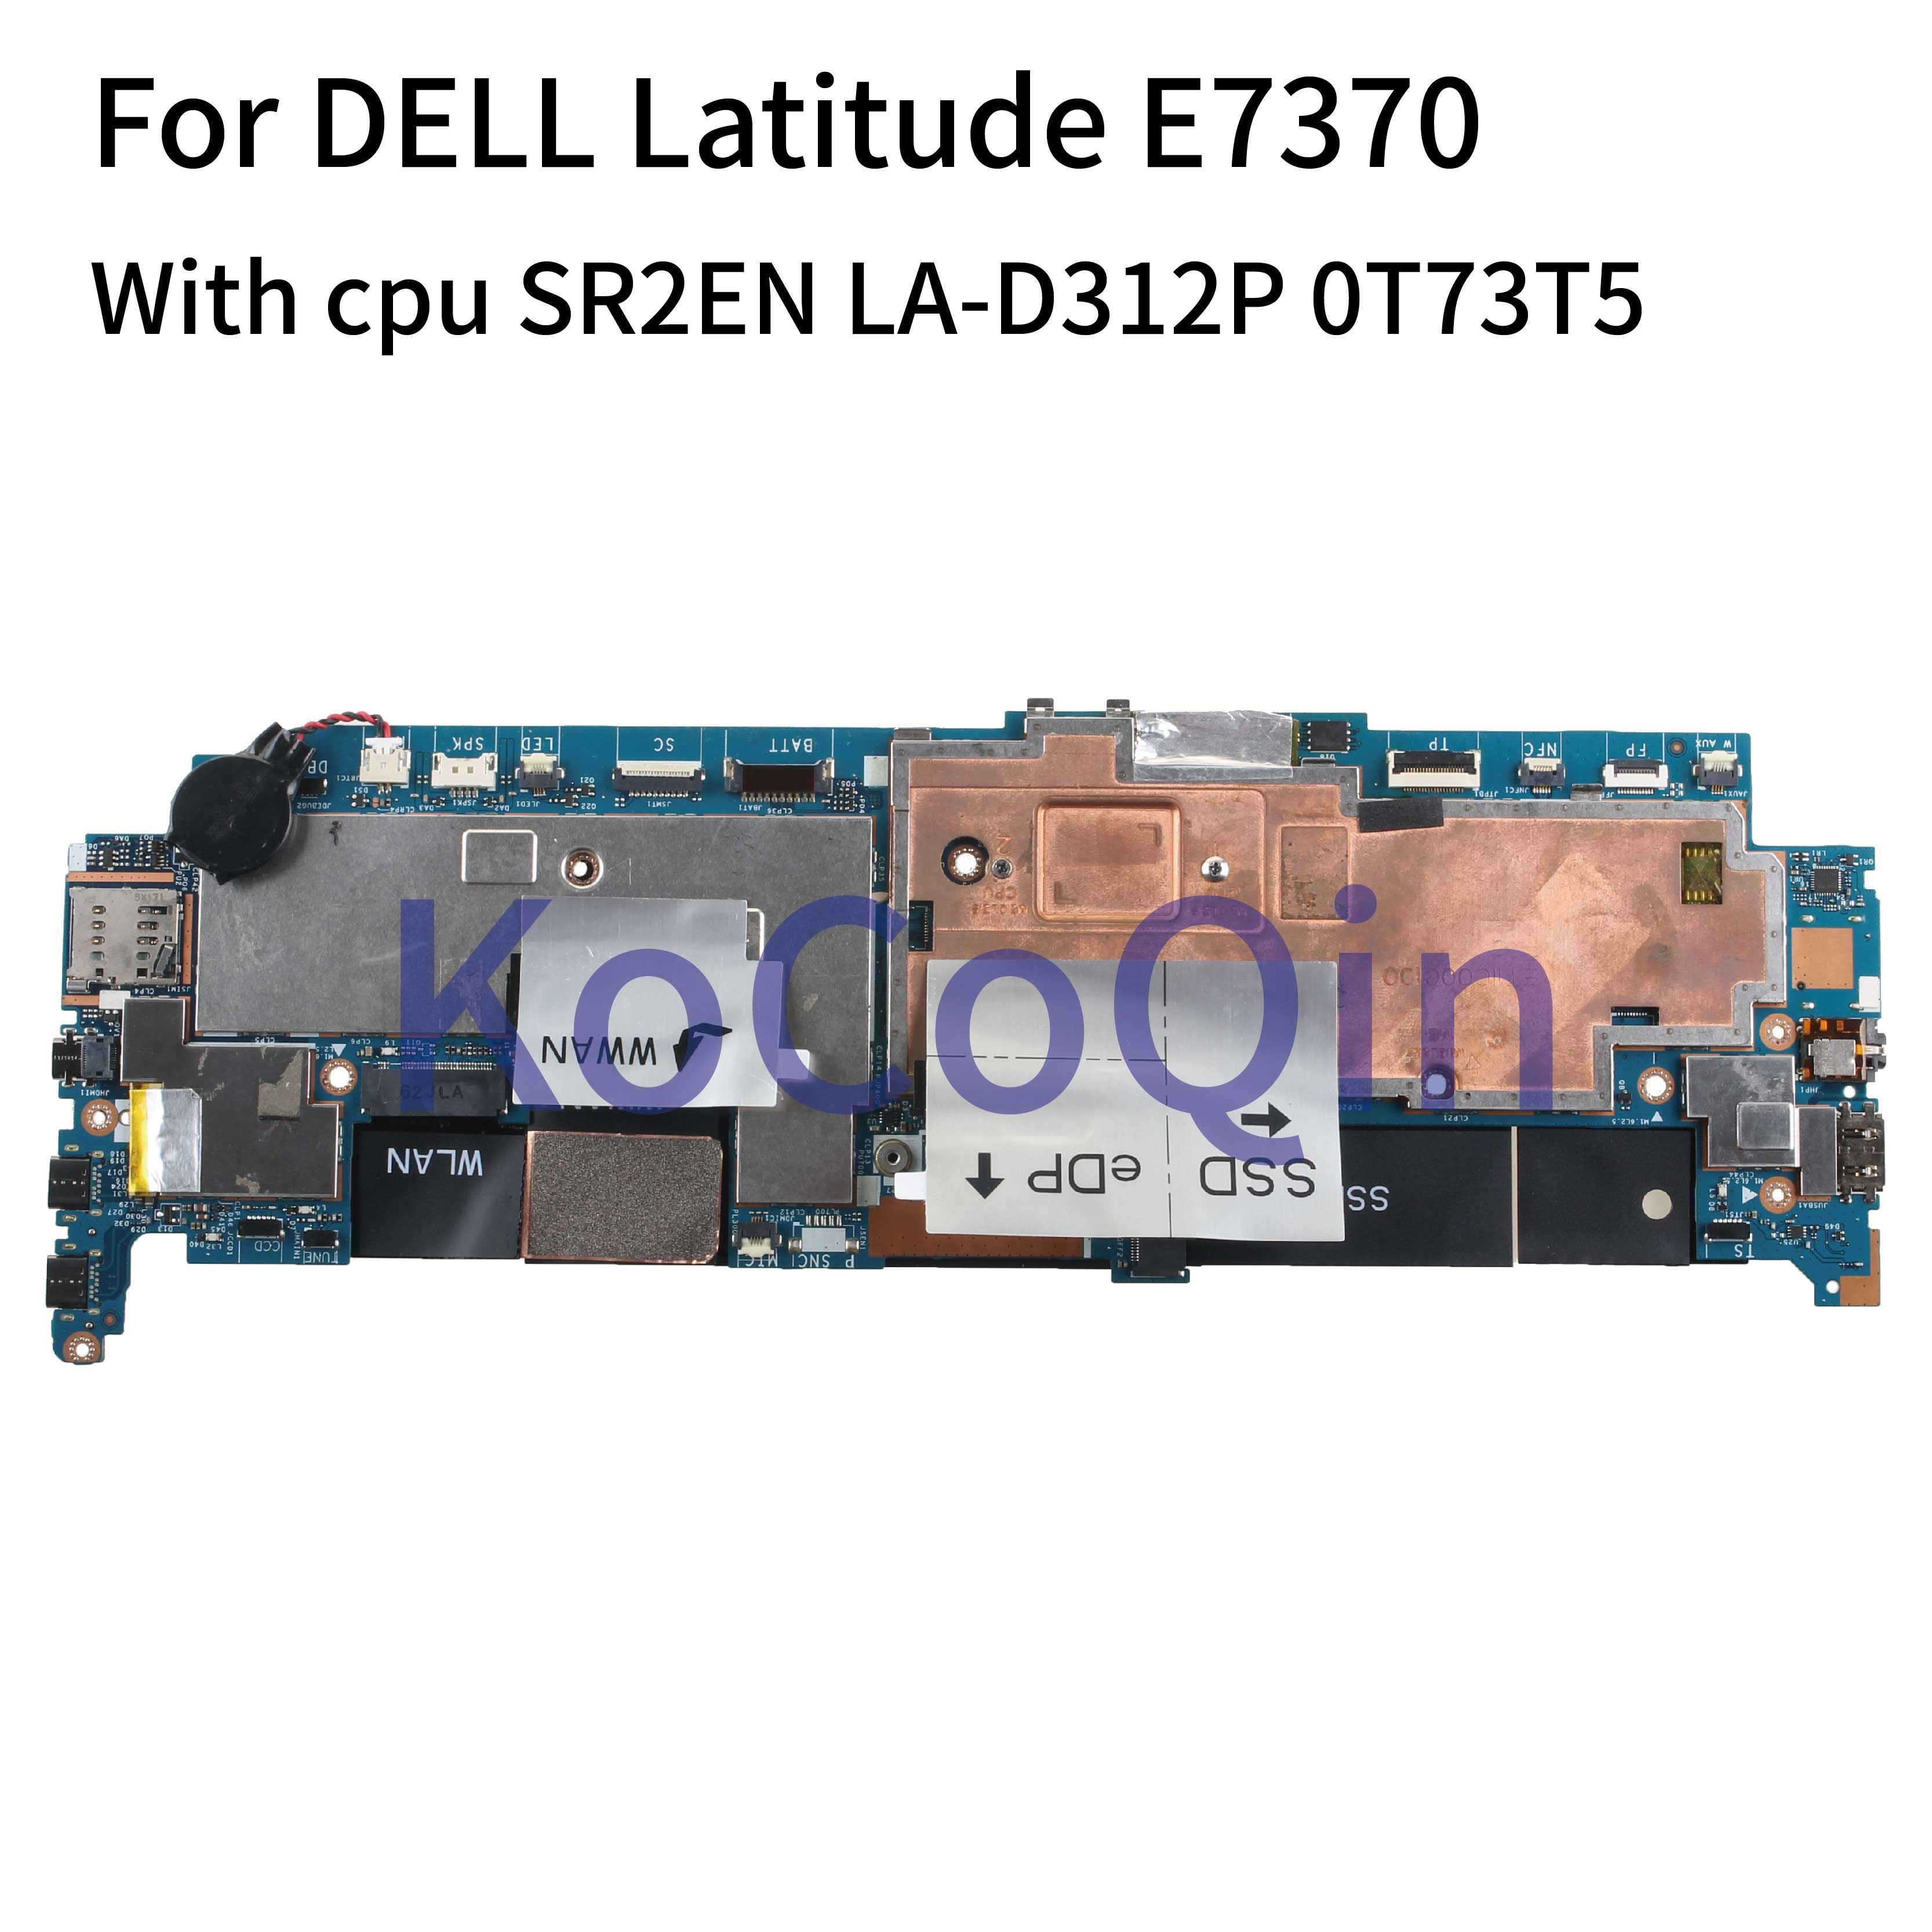 KoCoQin portátil placa base para Dell latitud E7370 Core M7-6Y75 8GB SR2EN placa base CN-0T73T5 0T73T5 LA-D312P